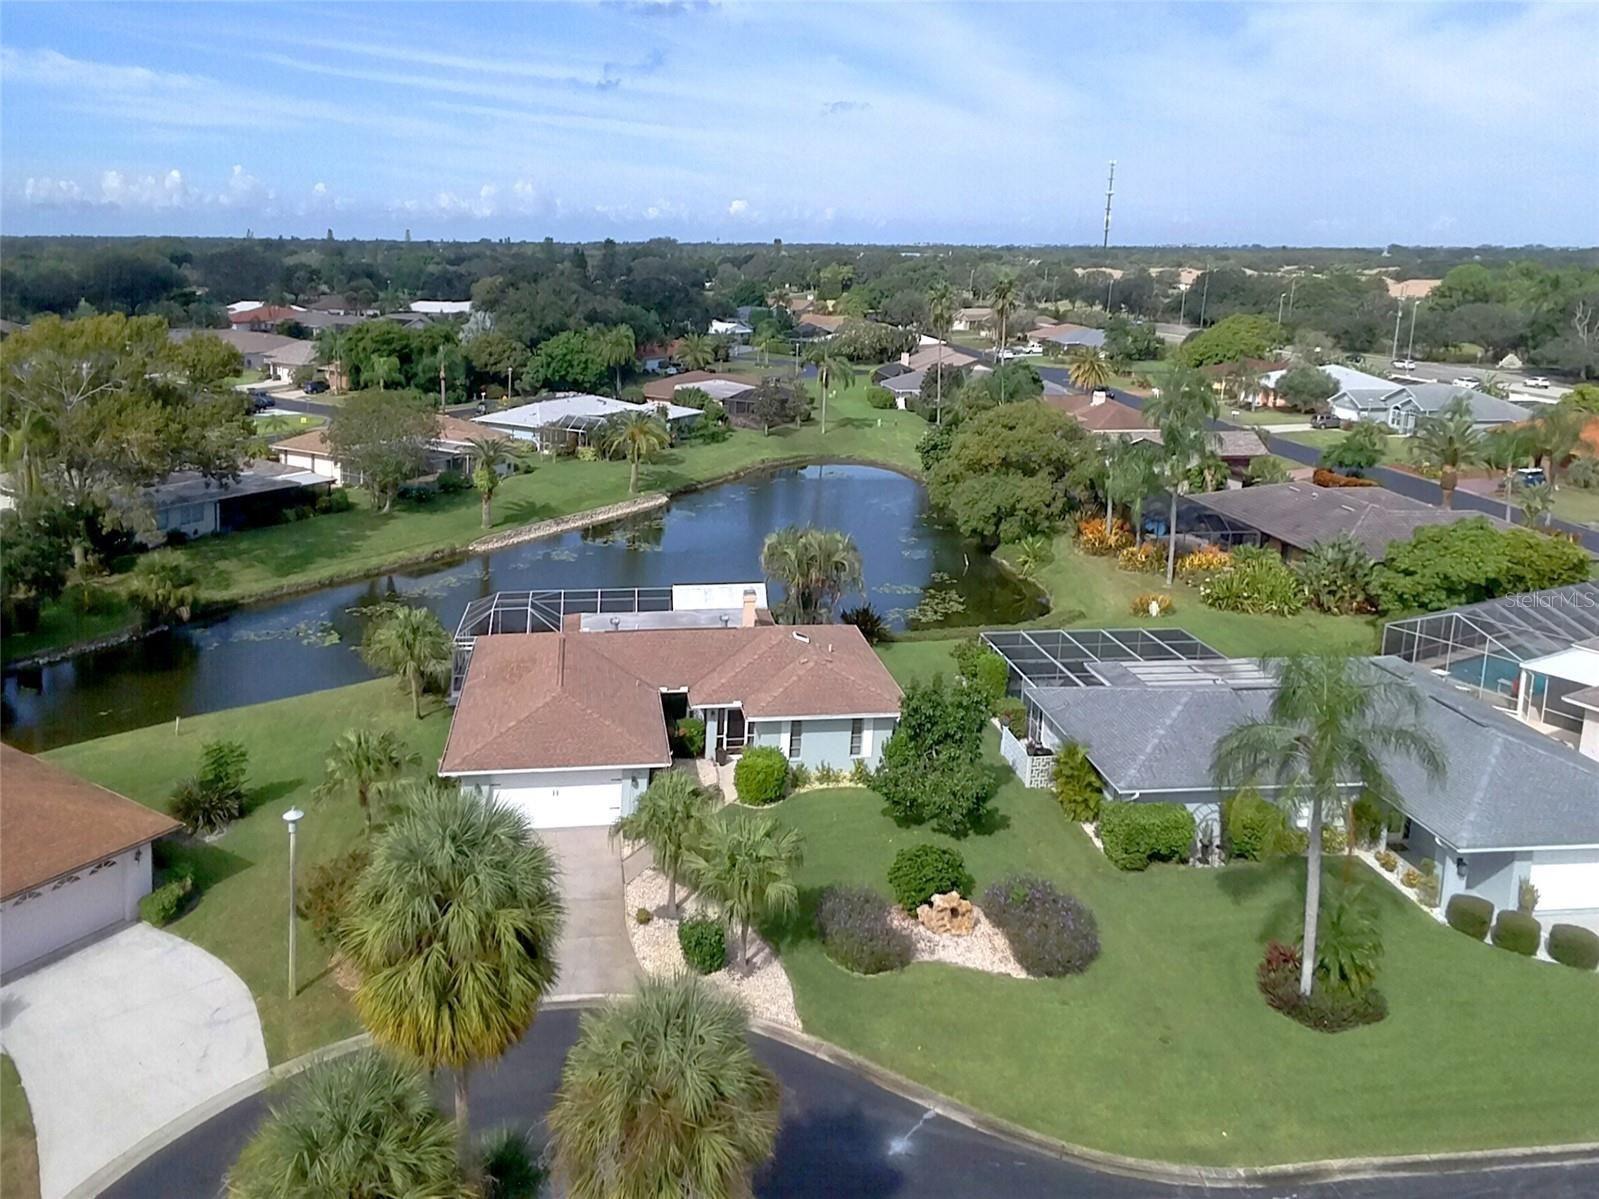 Photo of 1604 CYPRESS POINT COURT, VENICE, FL 34293 (MLS # N6118028)